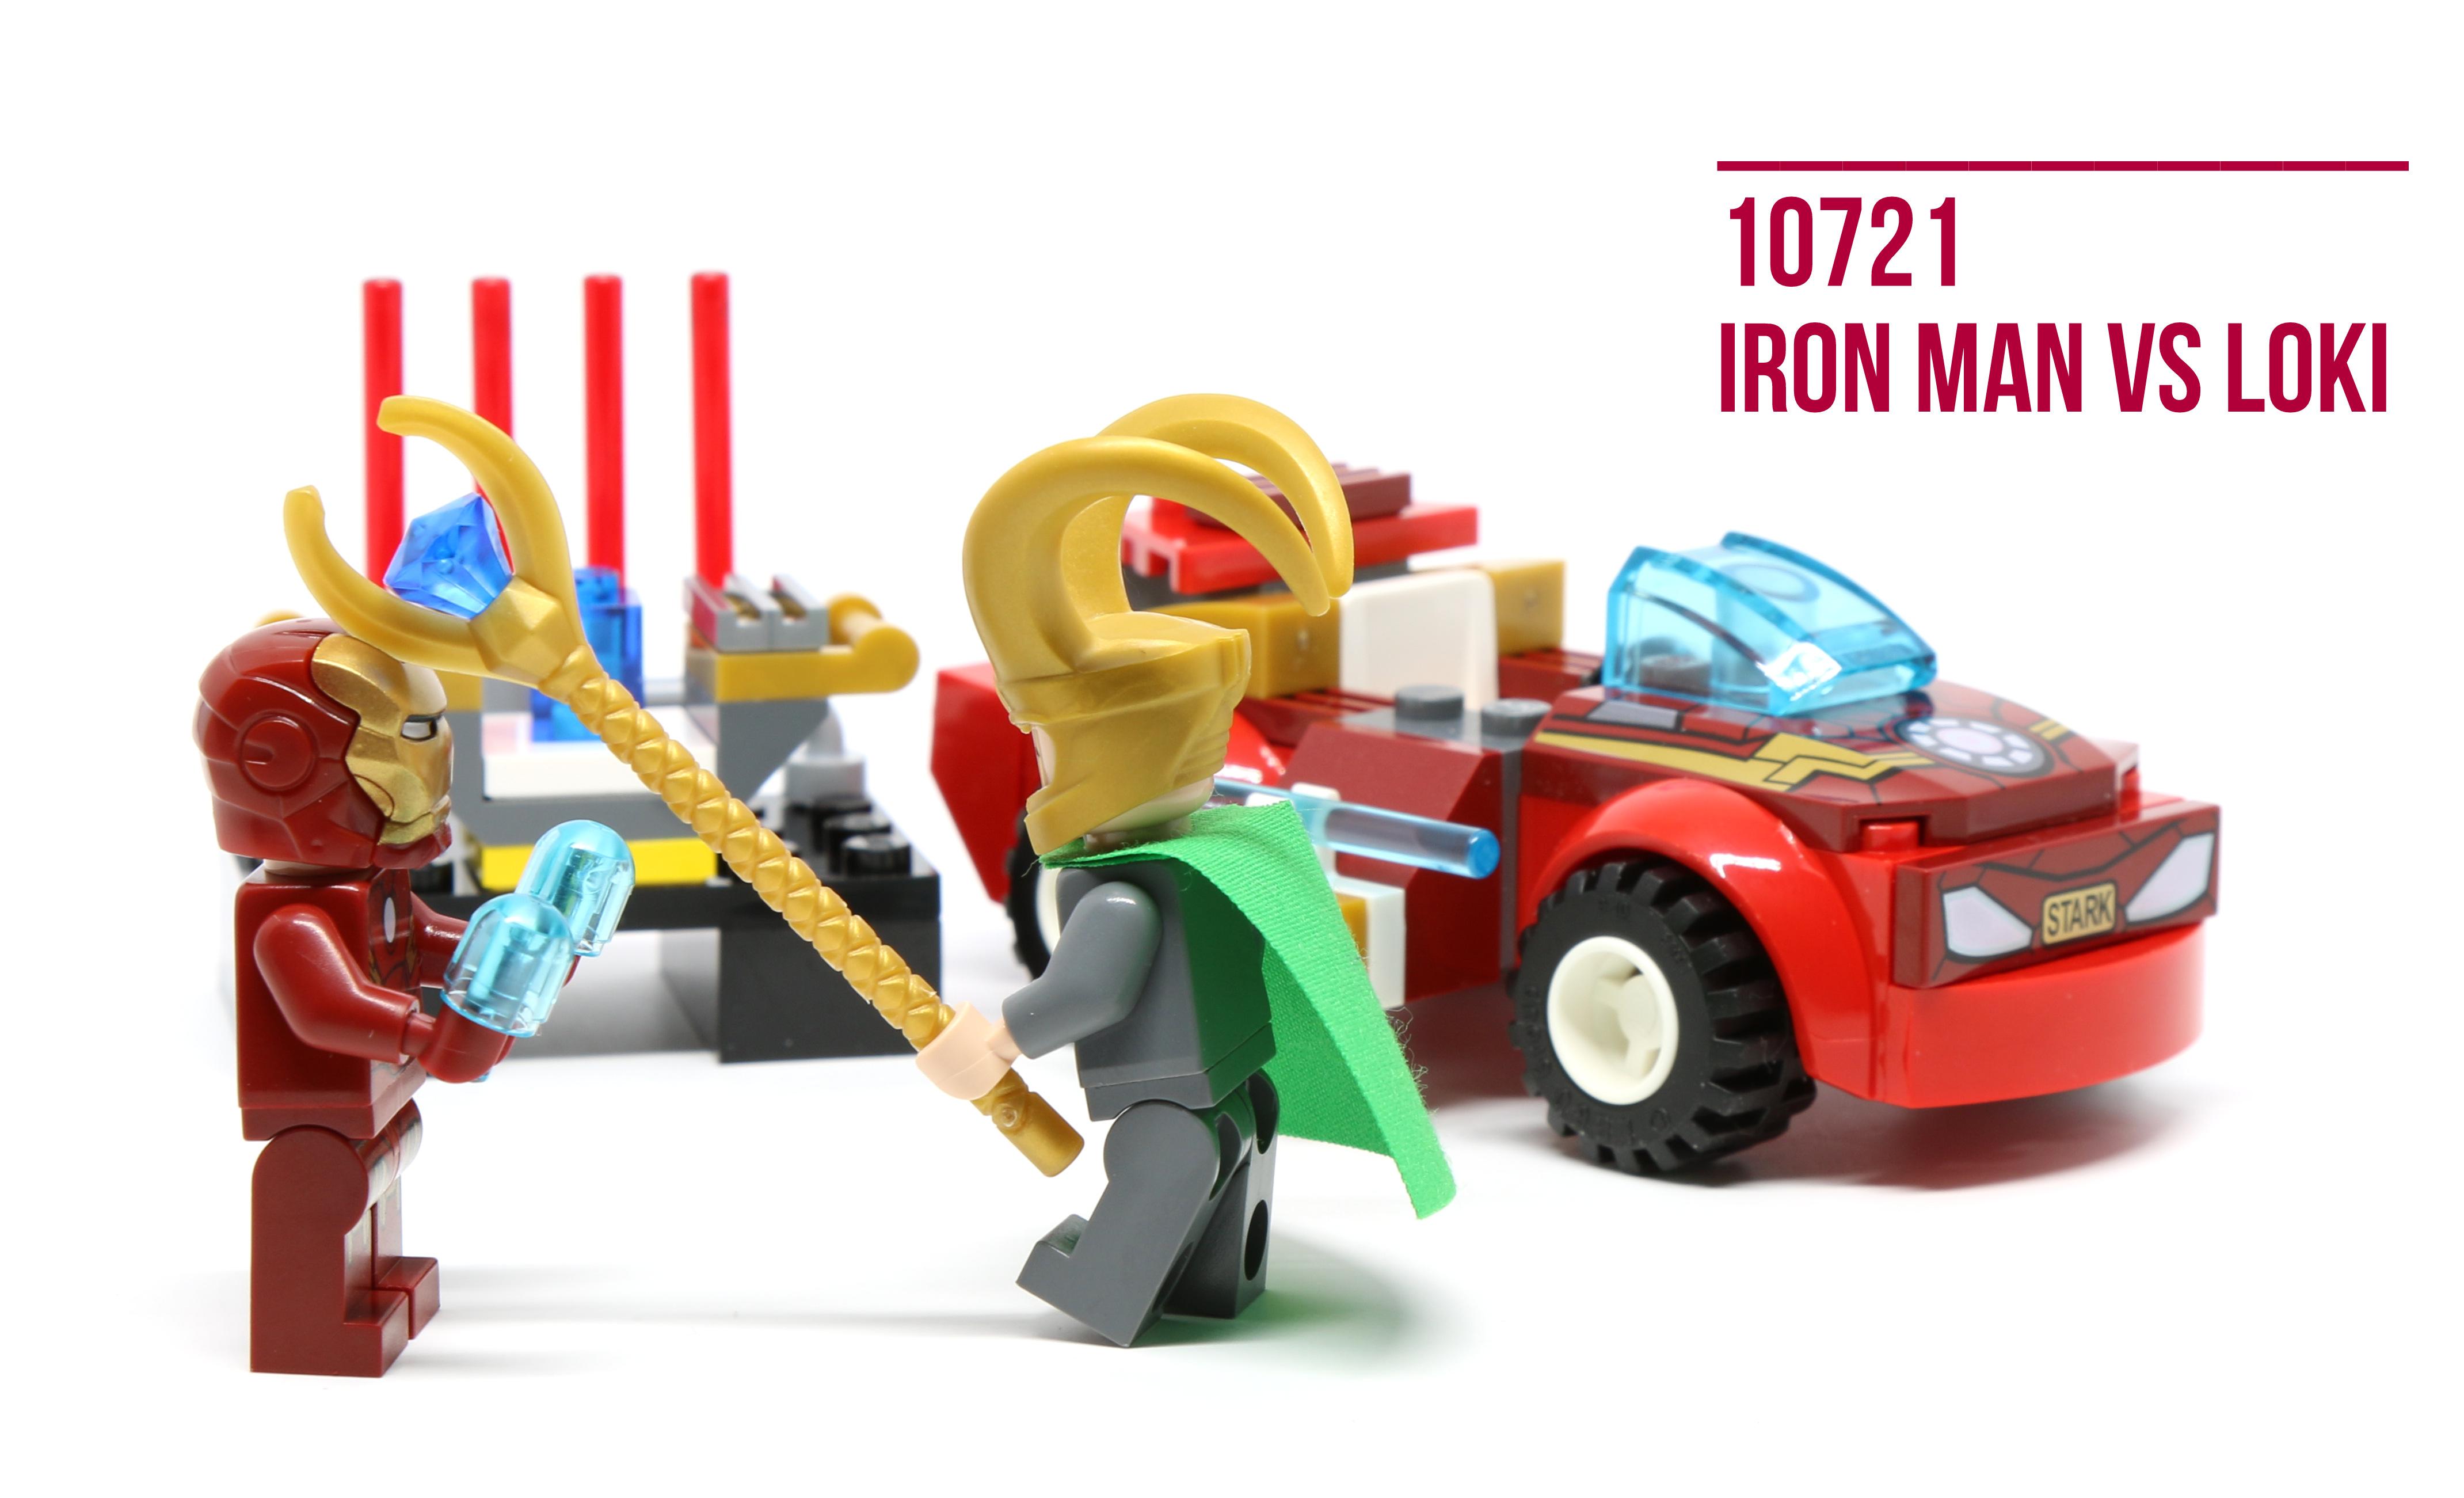 NO MINIFIGURES INCLUDED. LEGO 10721 JUNIORS MARVEL IRON MAN Vs LOKI SET